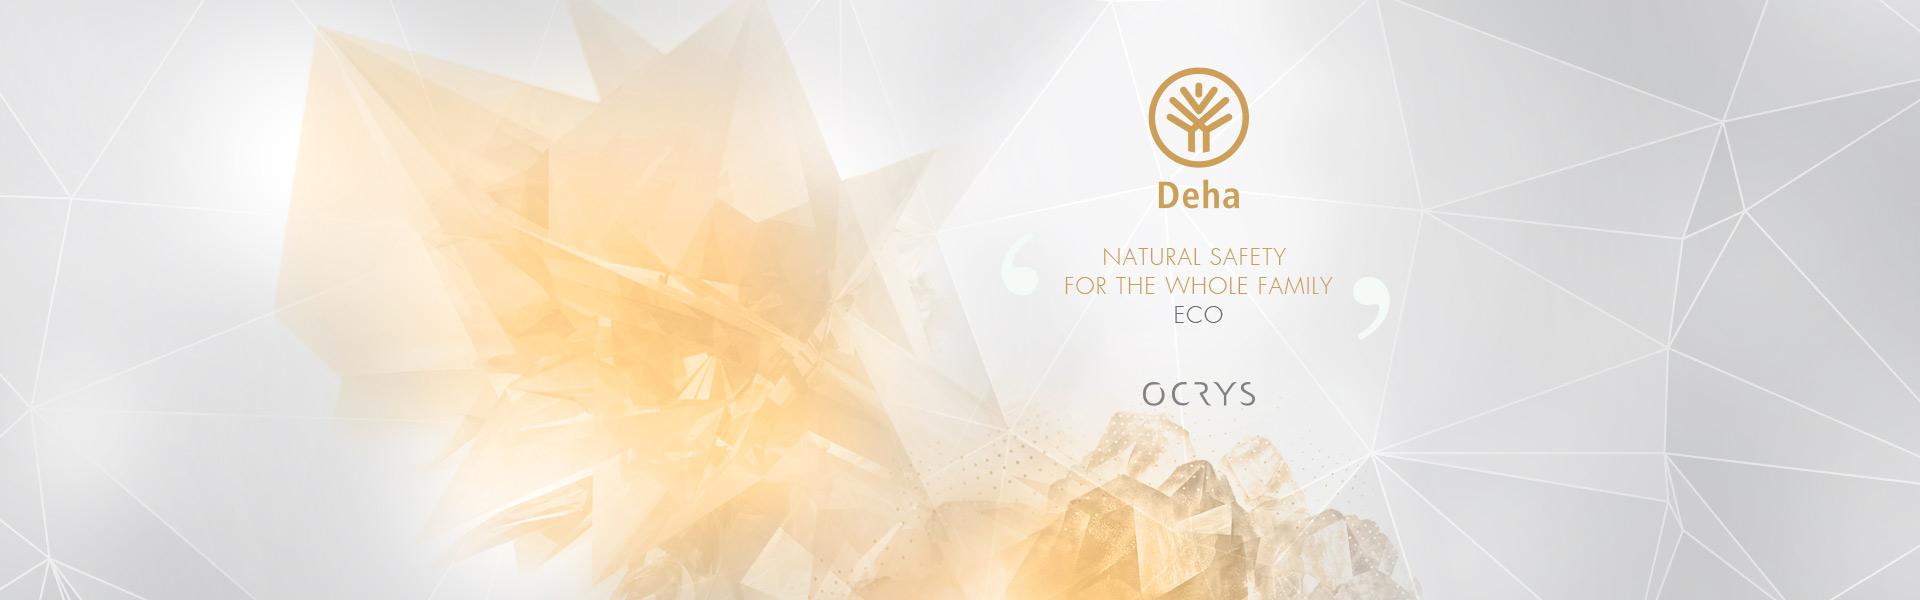 banner_centrali_OCRYS_DEHA